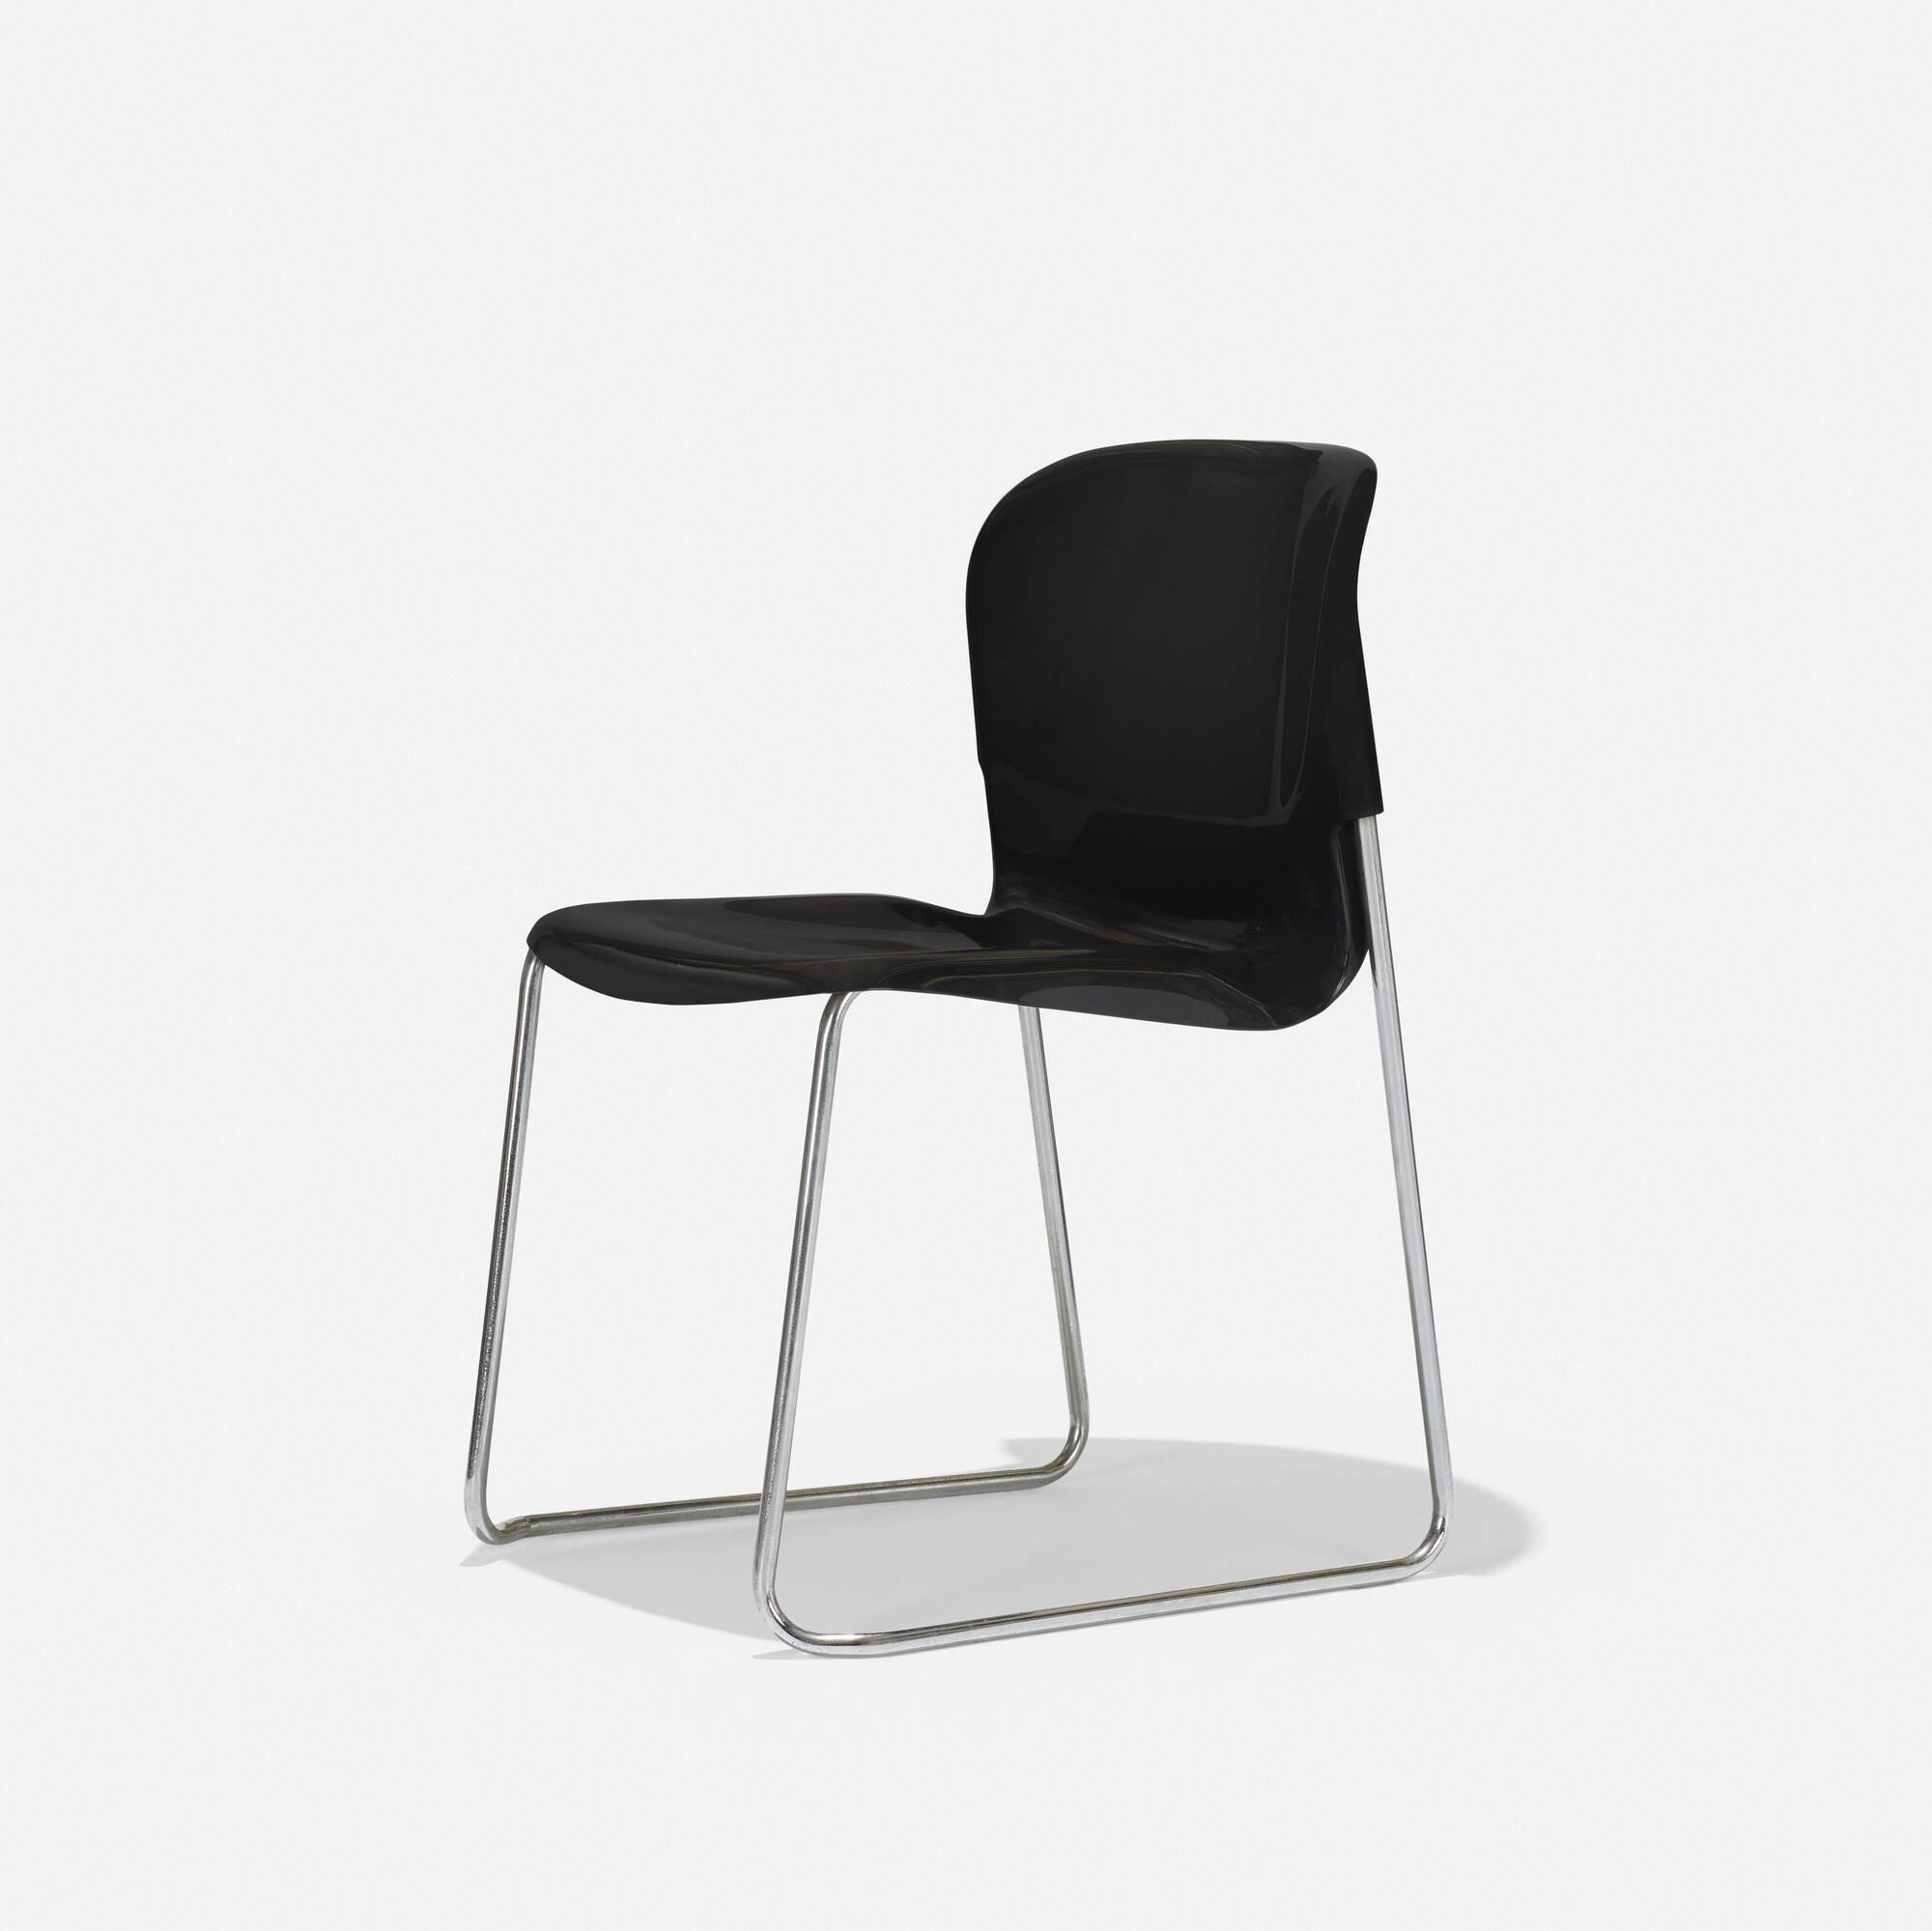 432: Gerd Lange / SM400K chair (1 of 3)